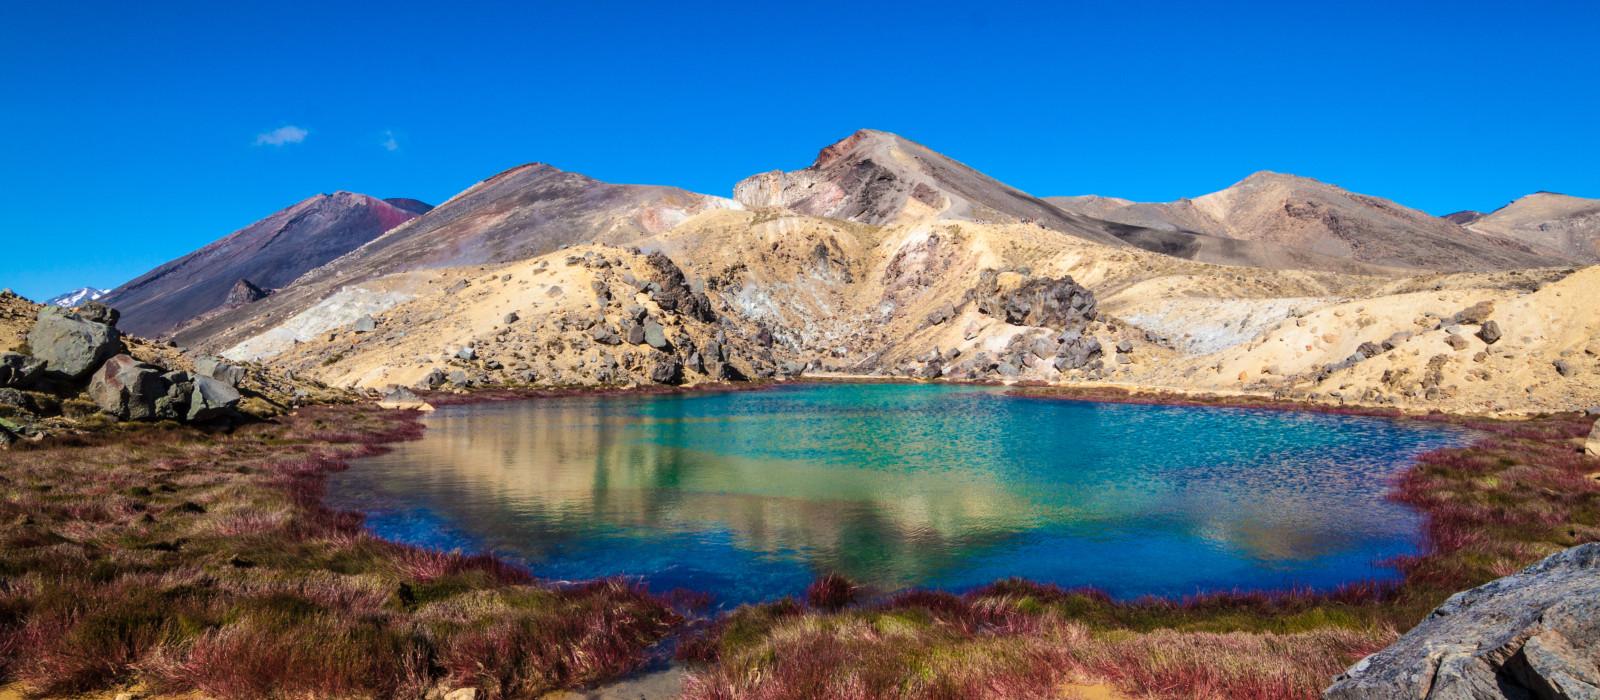 Destination Tongariro National Park New Zealand